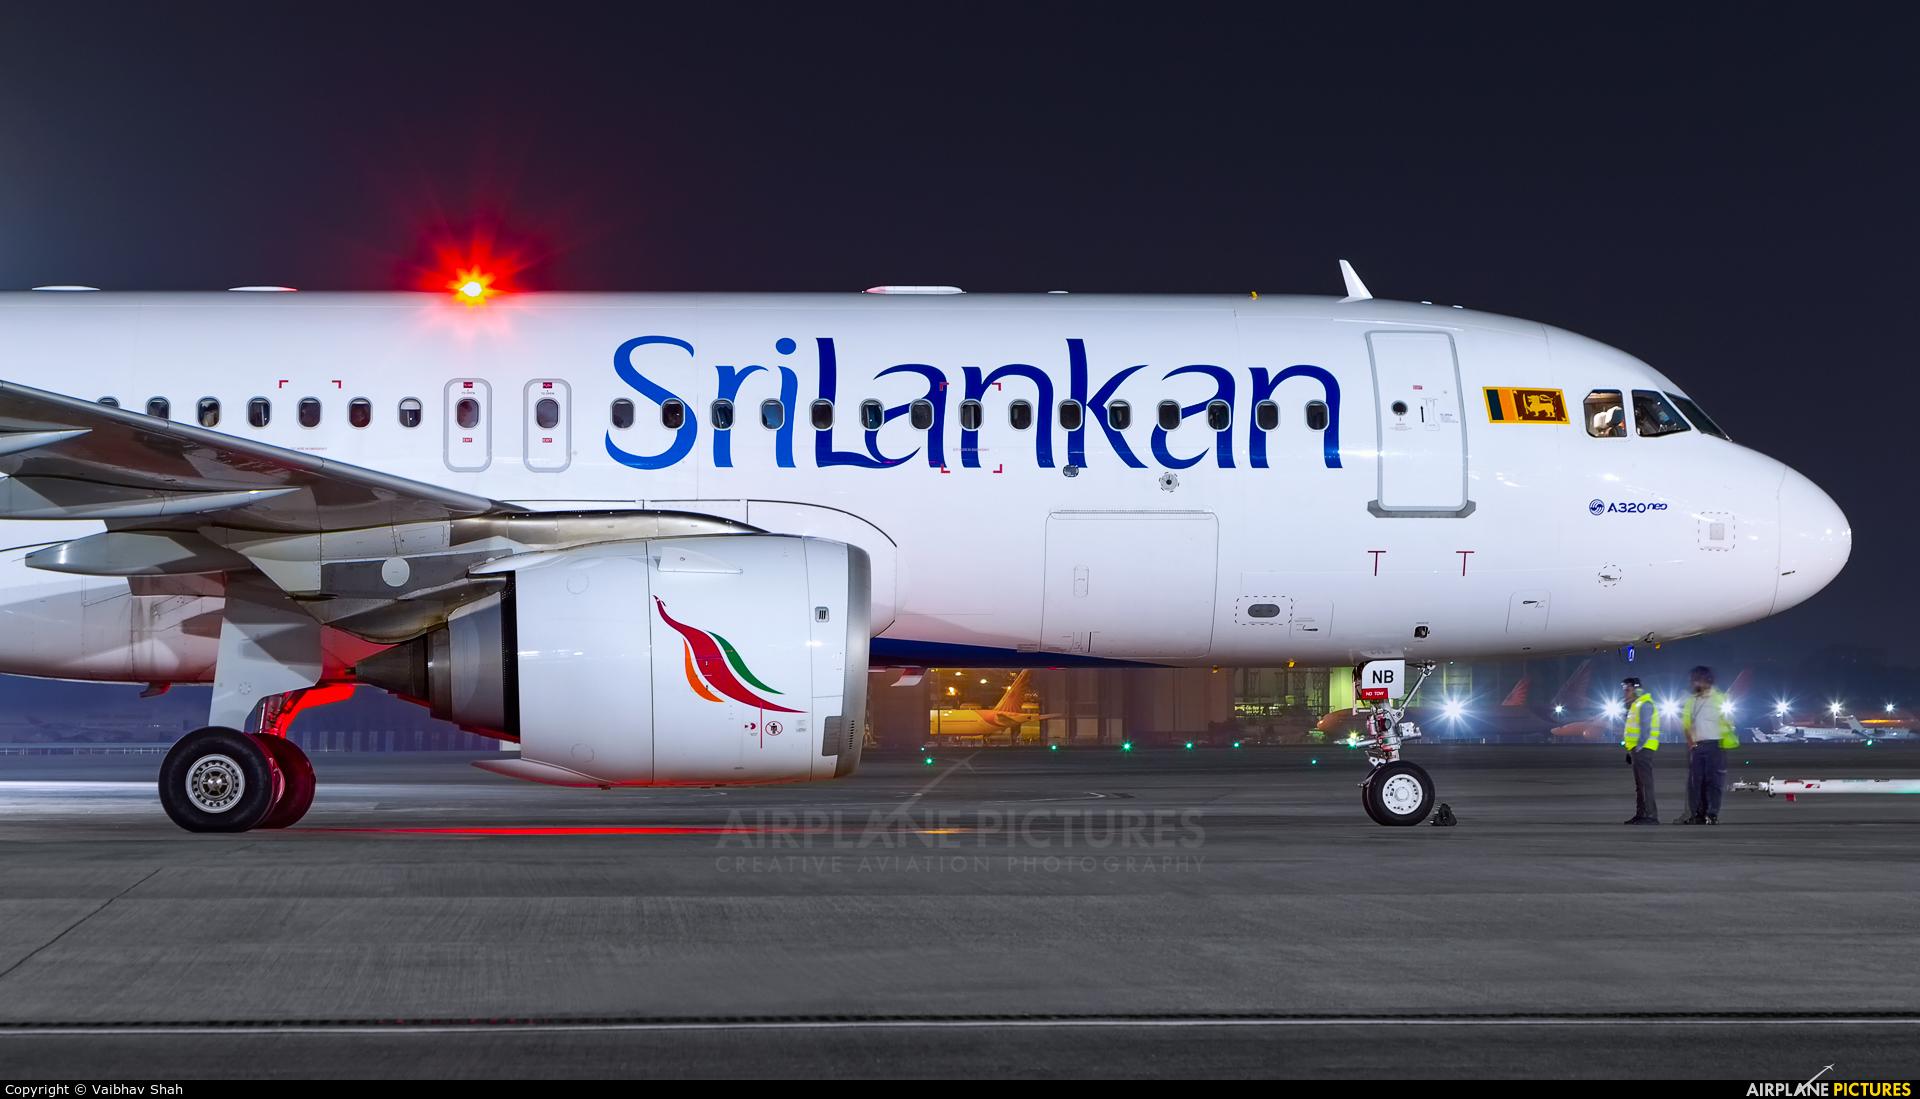 SriLankan Airlines 4R-ANB aircraft at Mumbai - Chhatrapati Shivaji Intl